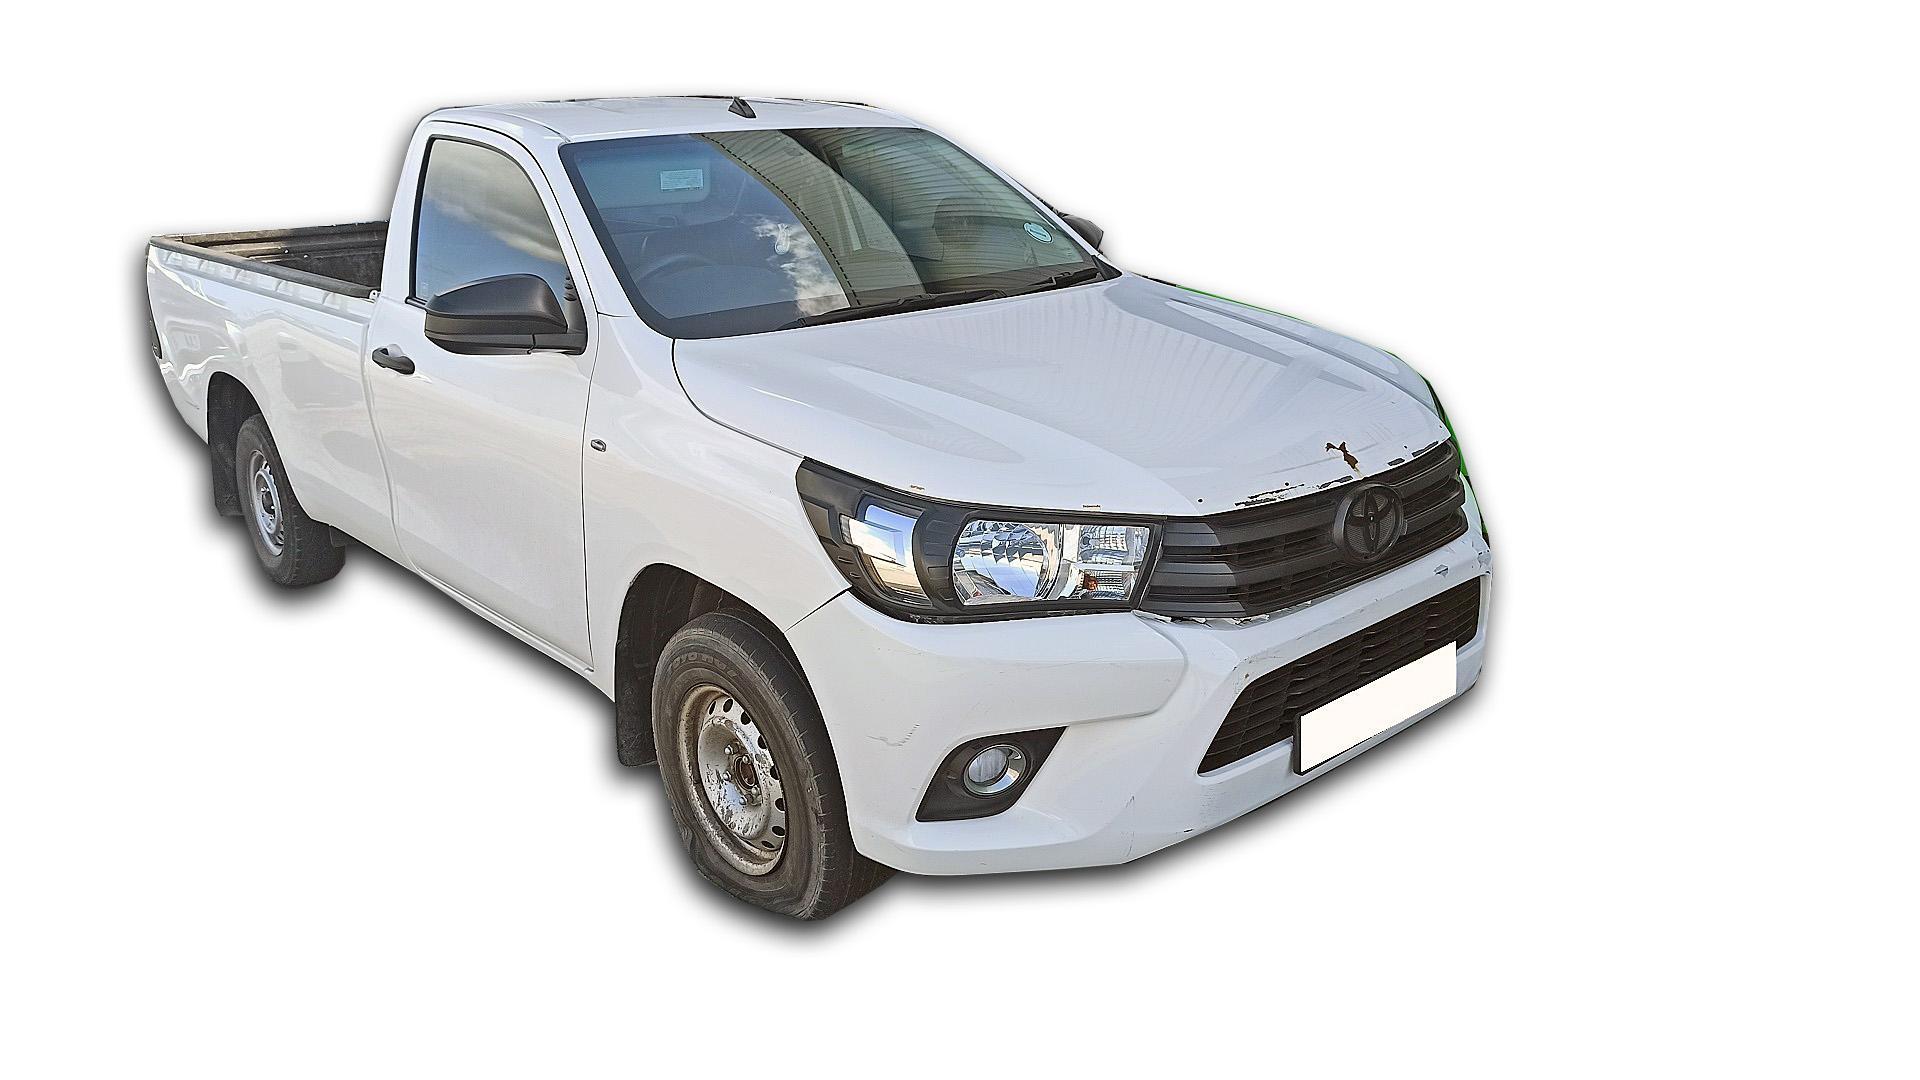 Toyota Hilux 2.0 Vvti P/U S/C